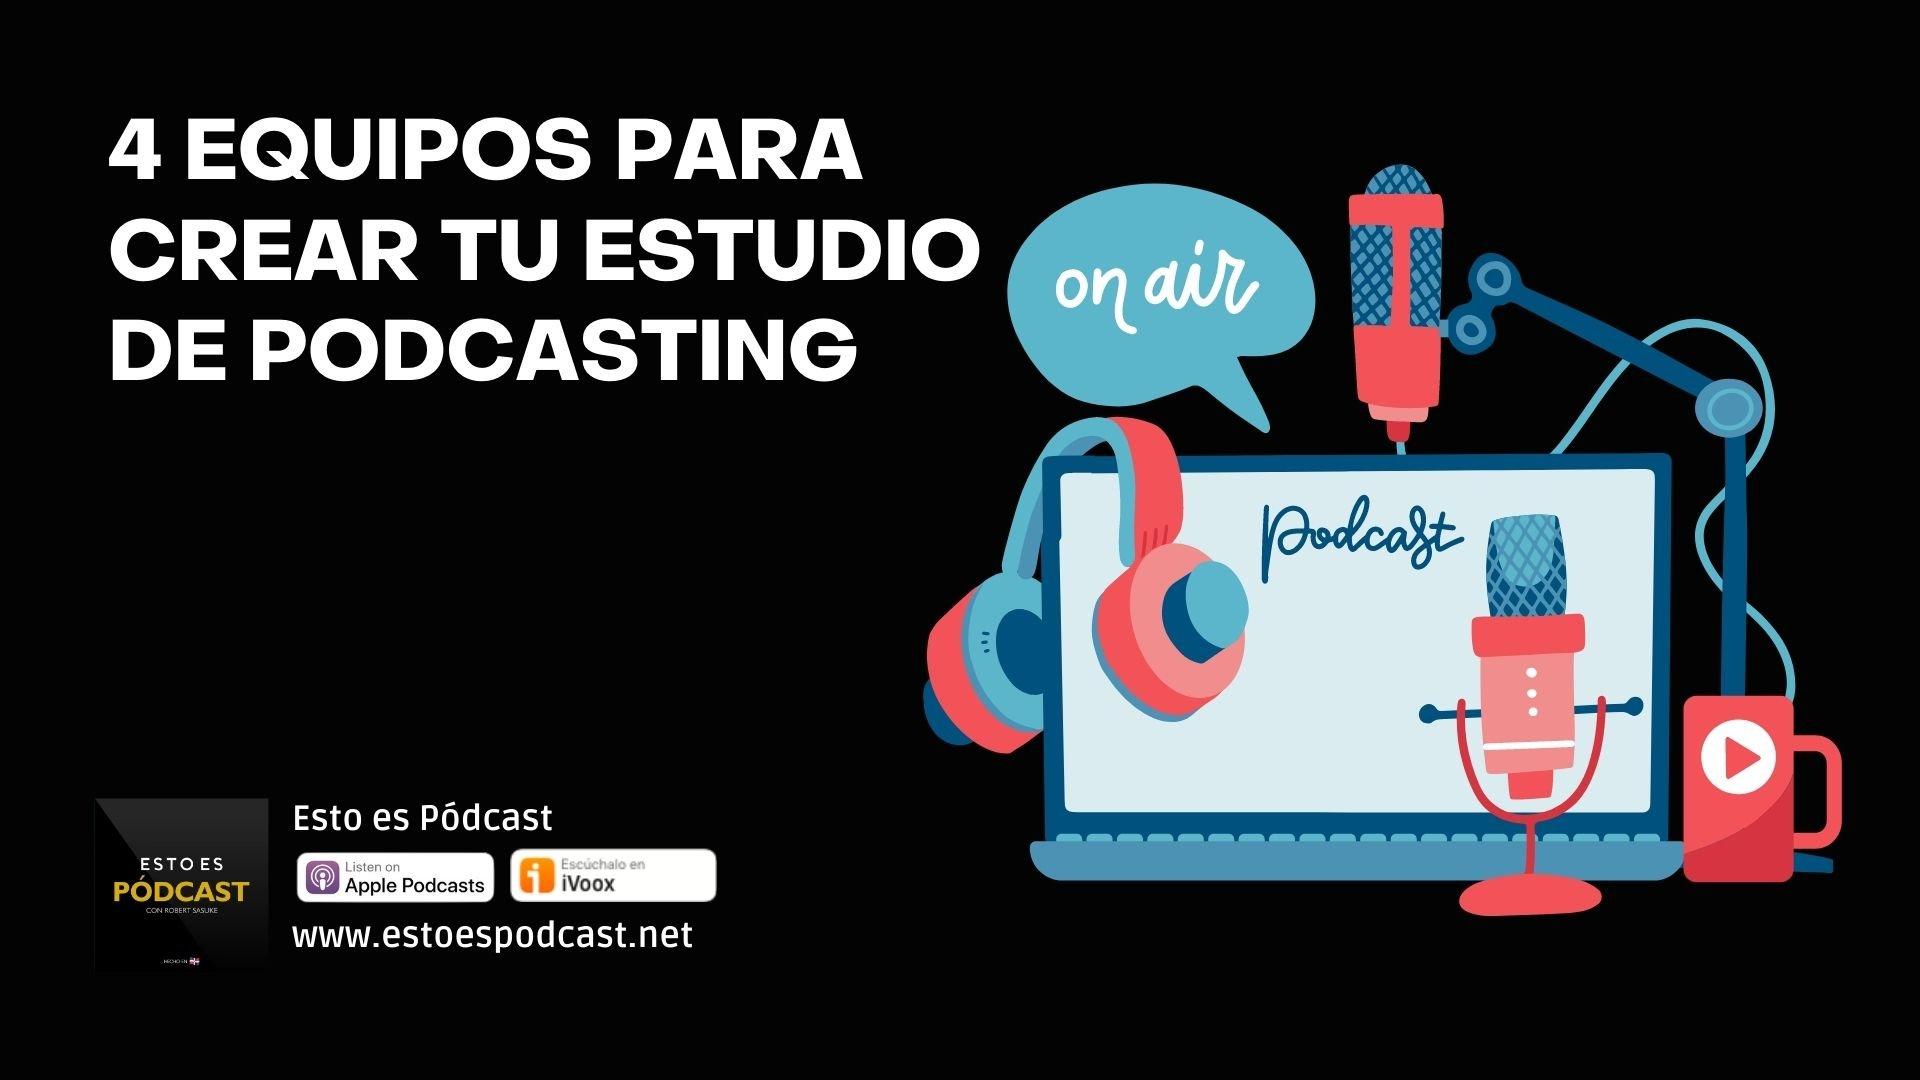 4 Equipos BBB para crear un estudio de podcasting